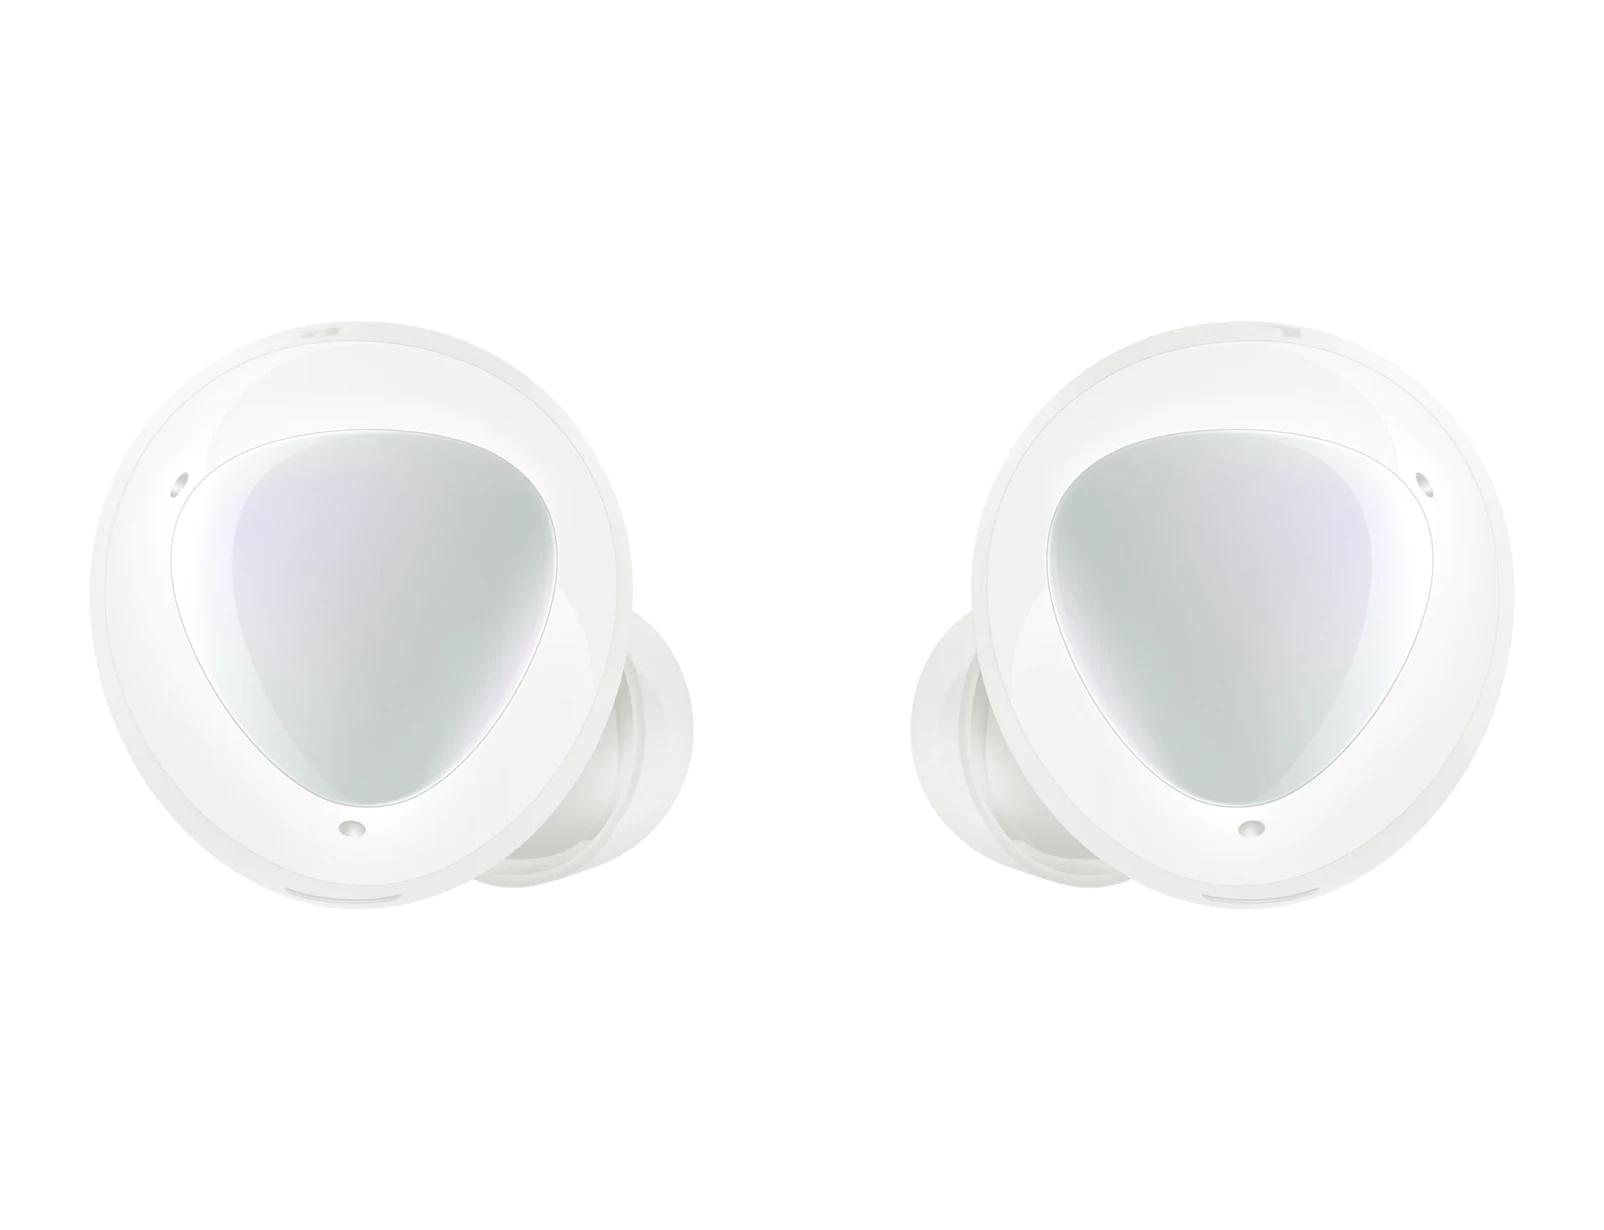 Qulaqlıq Samsung Galaxy Buds + White SM-R175NZWASER  - 3